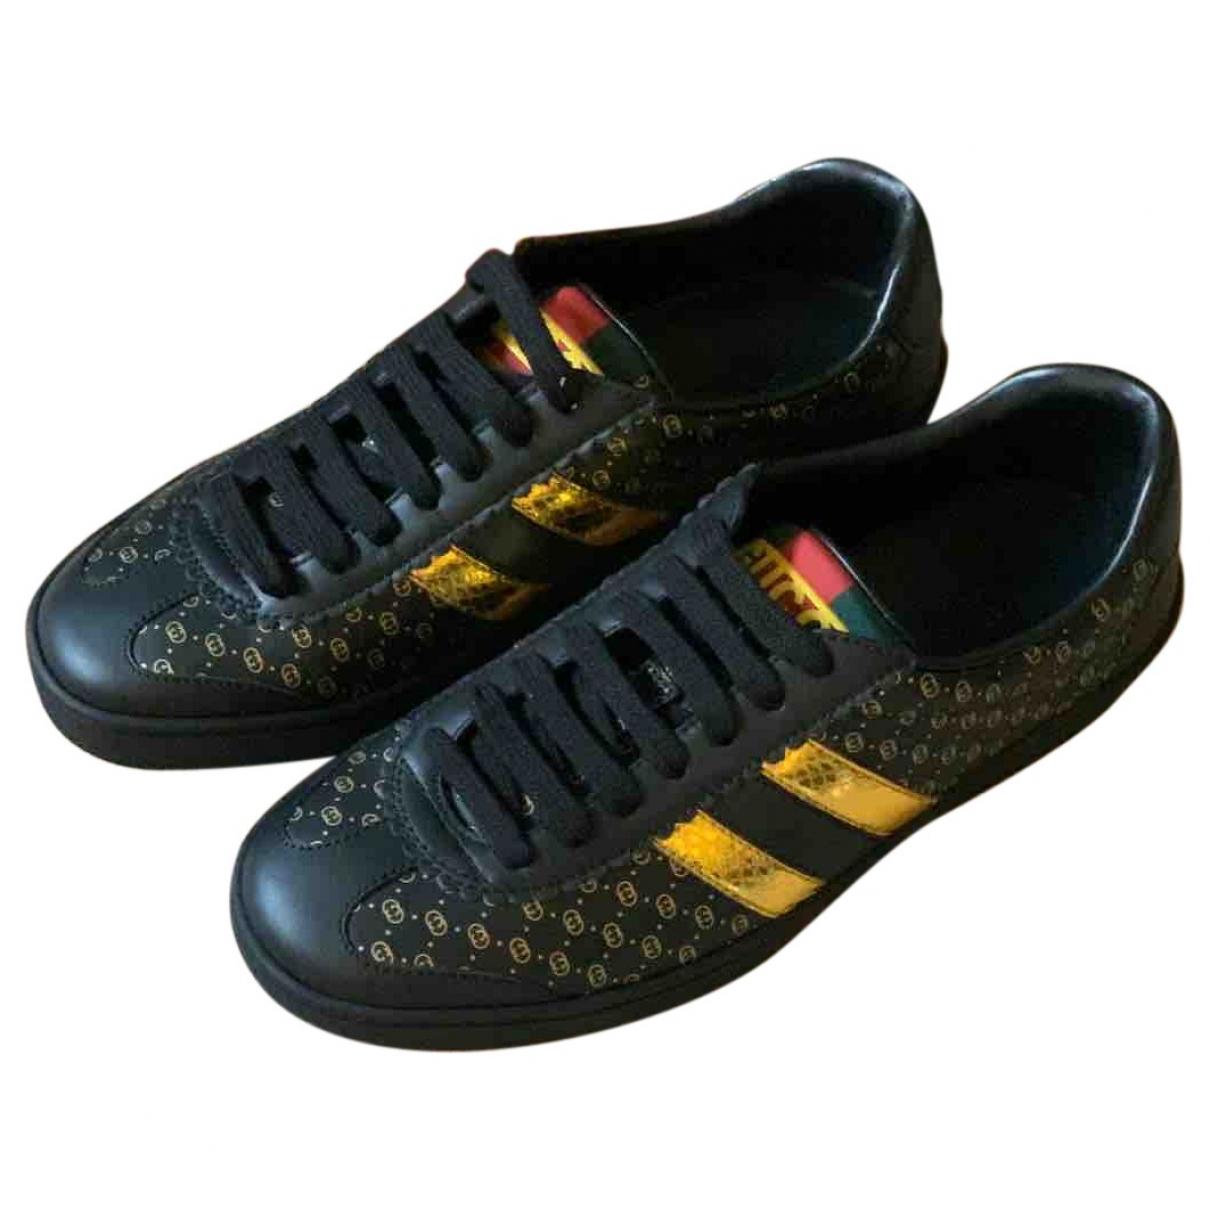 Gucci Gucci Dapper Dan Black Leather Trainers for Women 36.5 EU